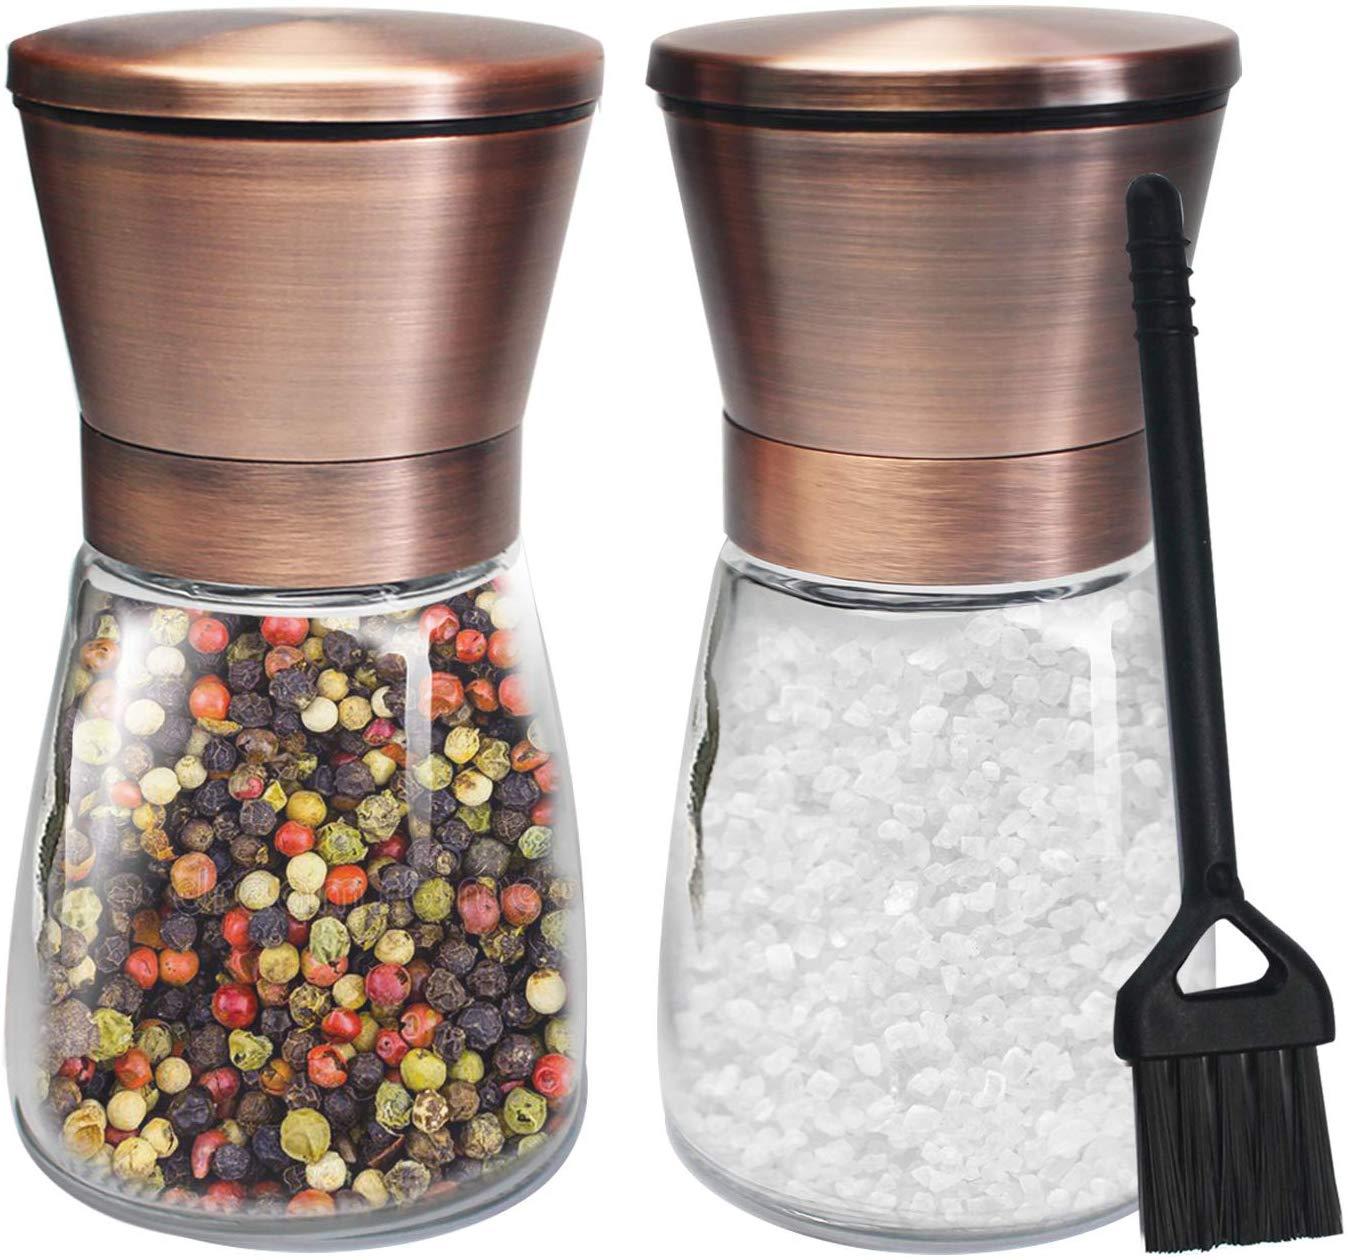 Copper Salt and Pepper Grinder Set of 2 Stainless Steel Salt and Pepper Shakers with Adjustable Ceramic Coarseness Salt Grinders and Pepper Mill Shaker Spice Grinder Mill Set with Free Cleaning Brush